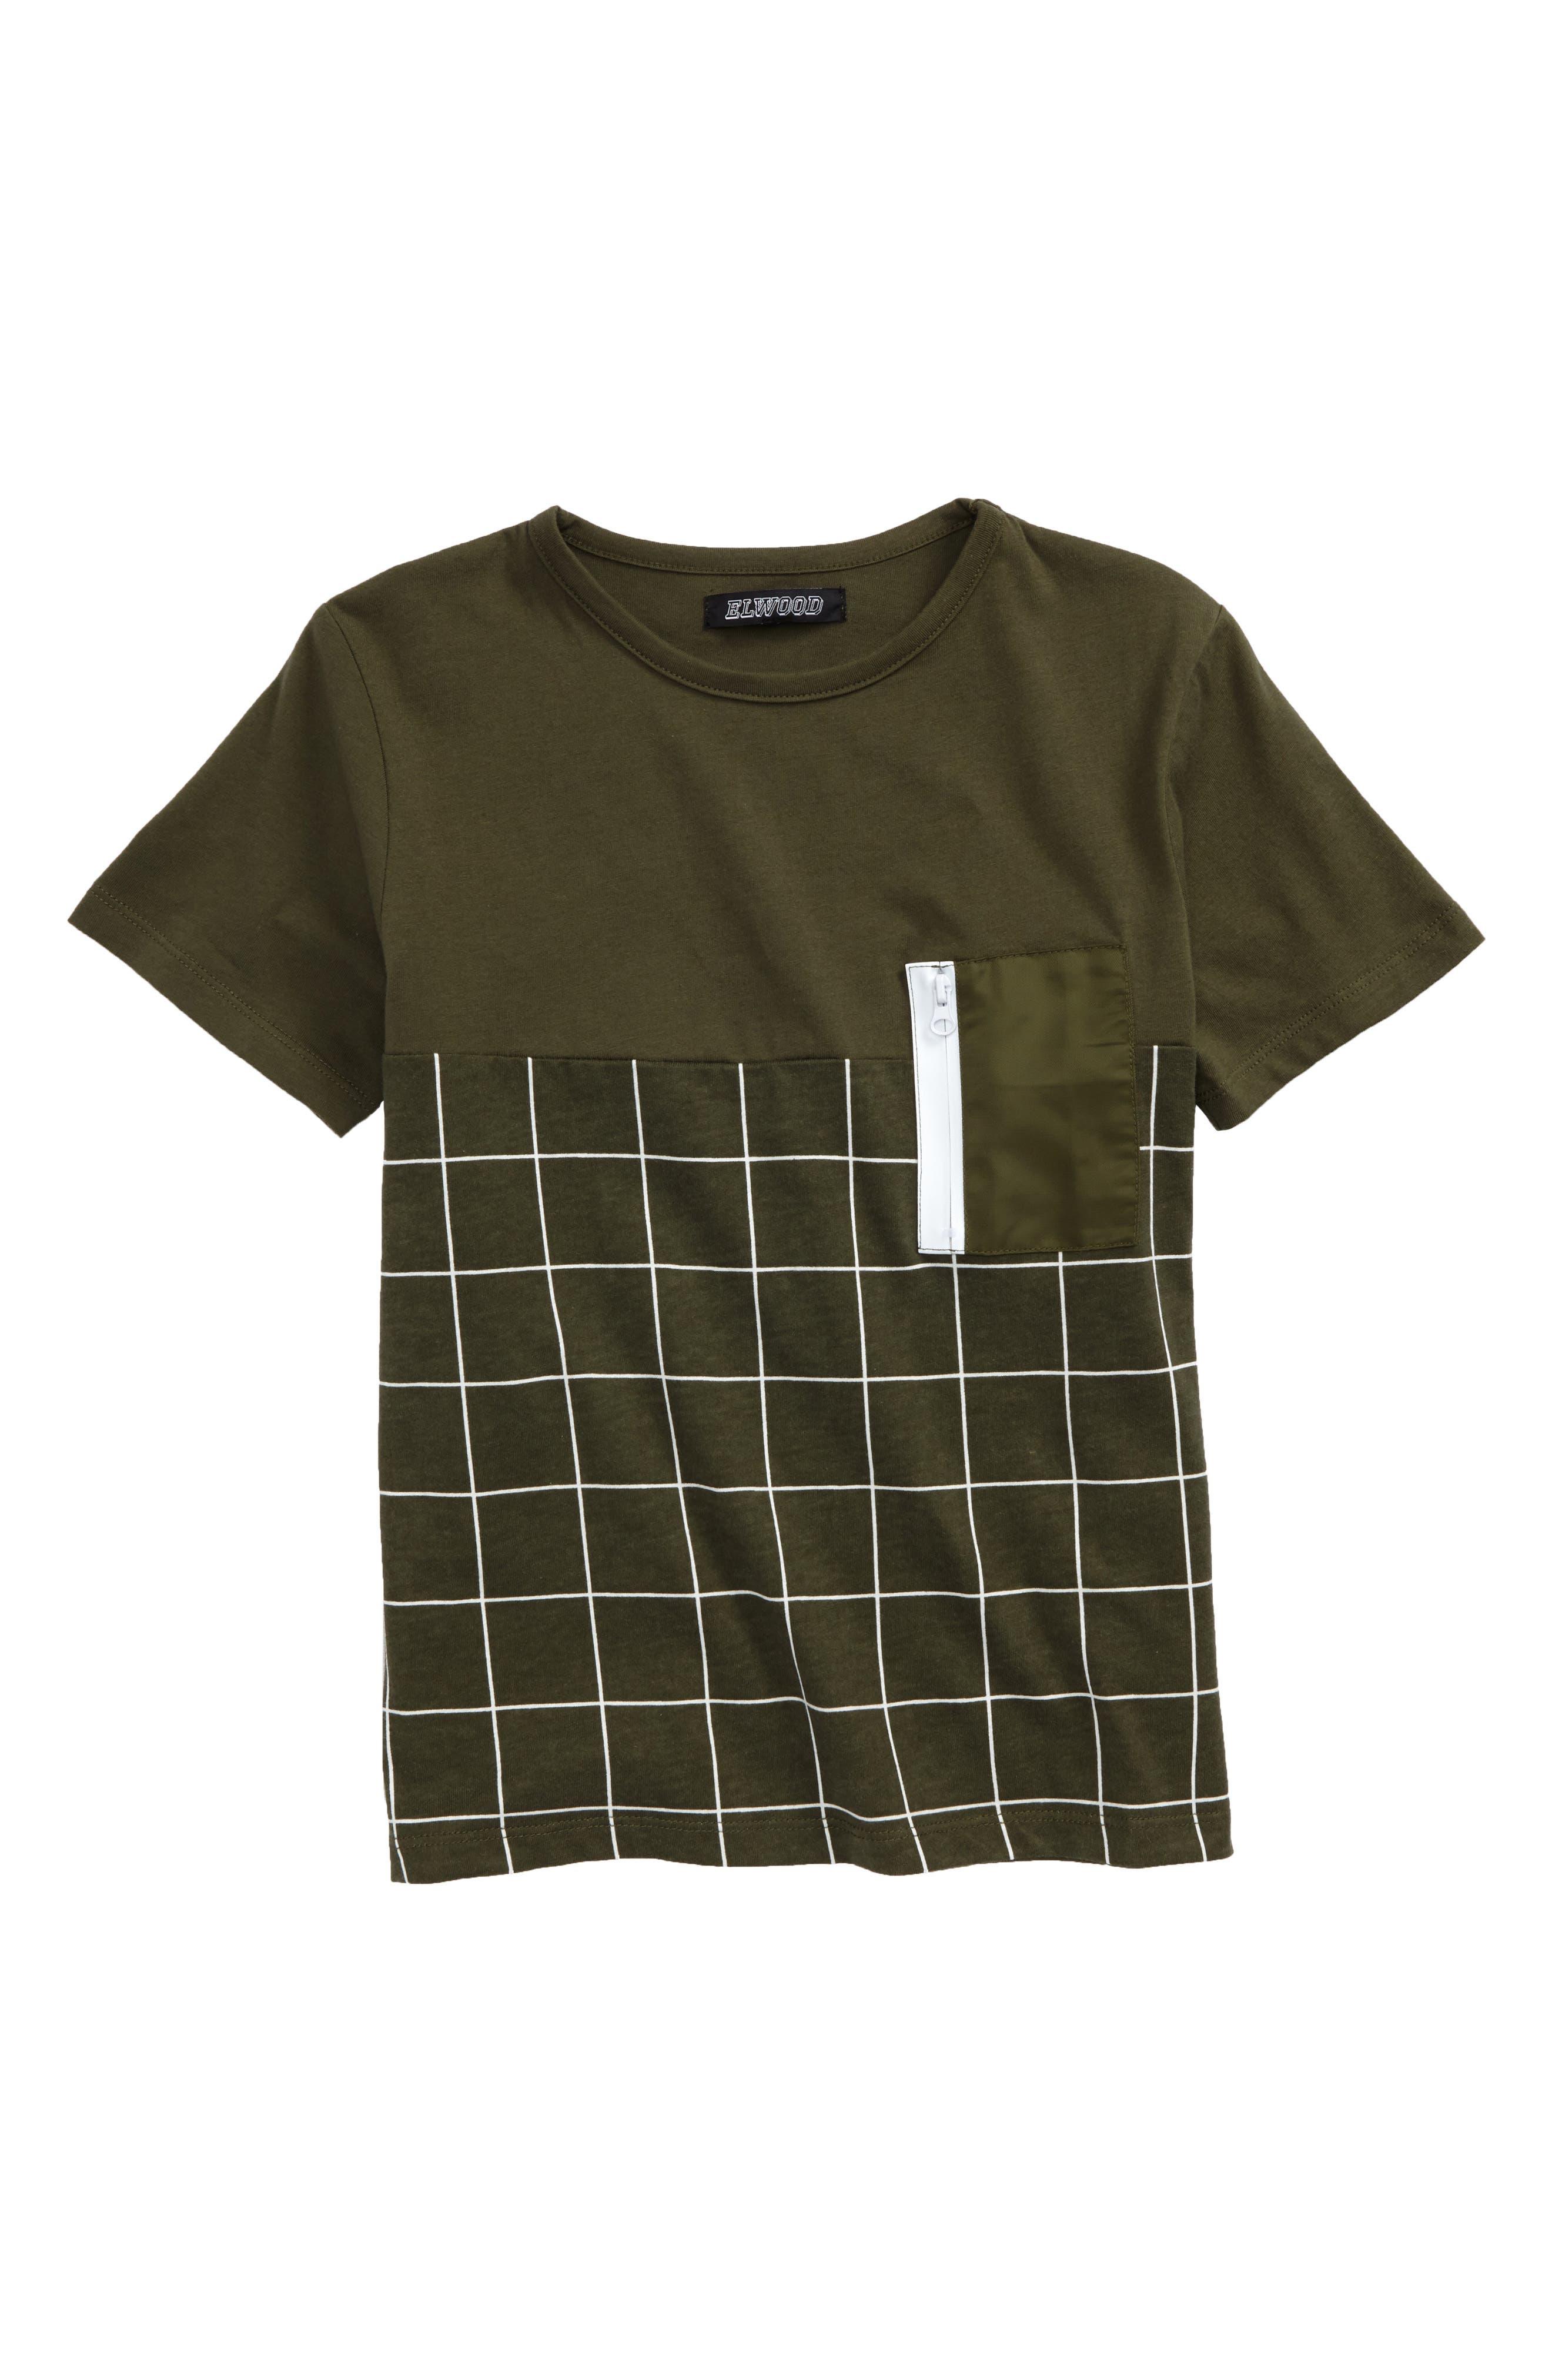 Alternate Image 1 Selected - Elwood Contrast Pocket T-Shirt (Little Boys & Big Boys)